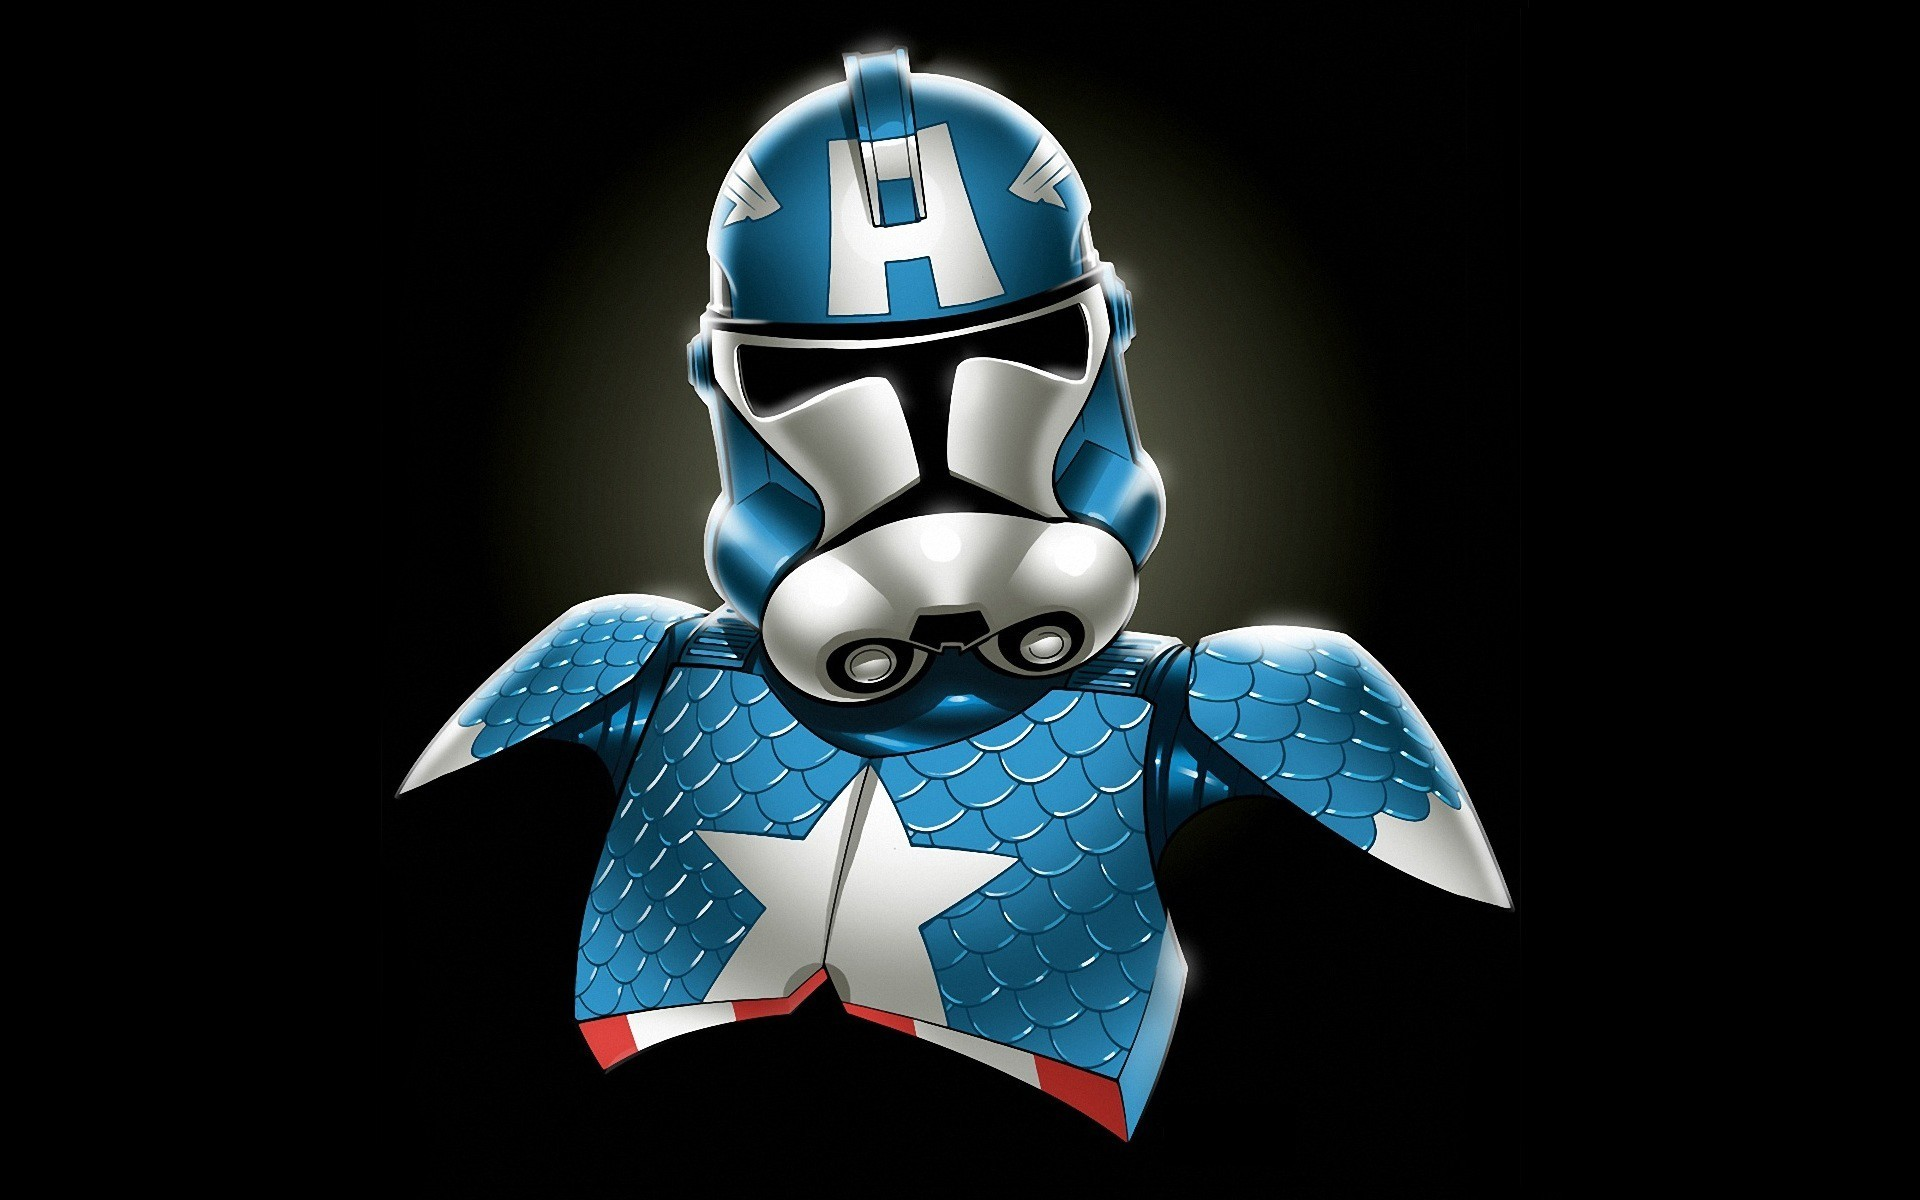 Star Wars Minimalistic Stormtroopers Captain America Marvel Comics Redneck  Wallpaper At 3d Wallpapers